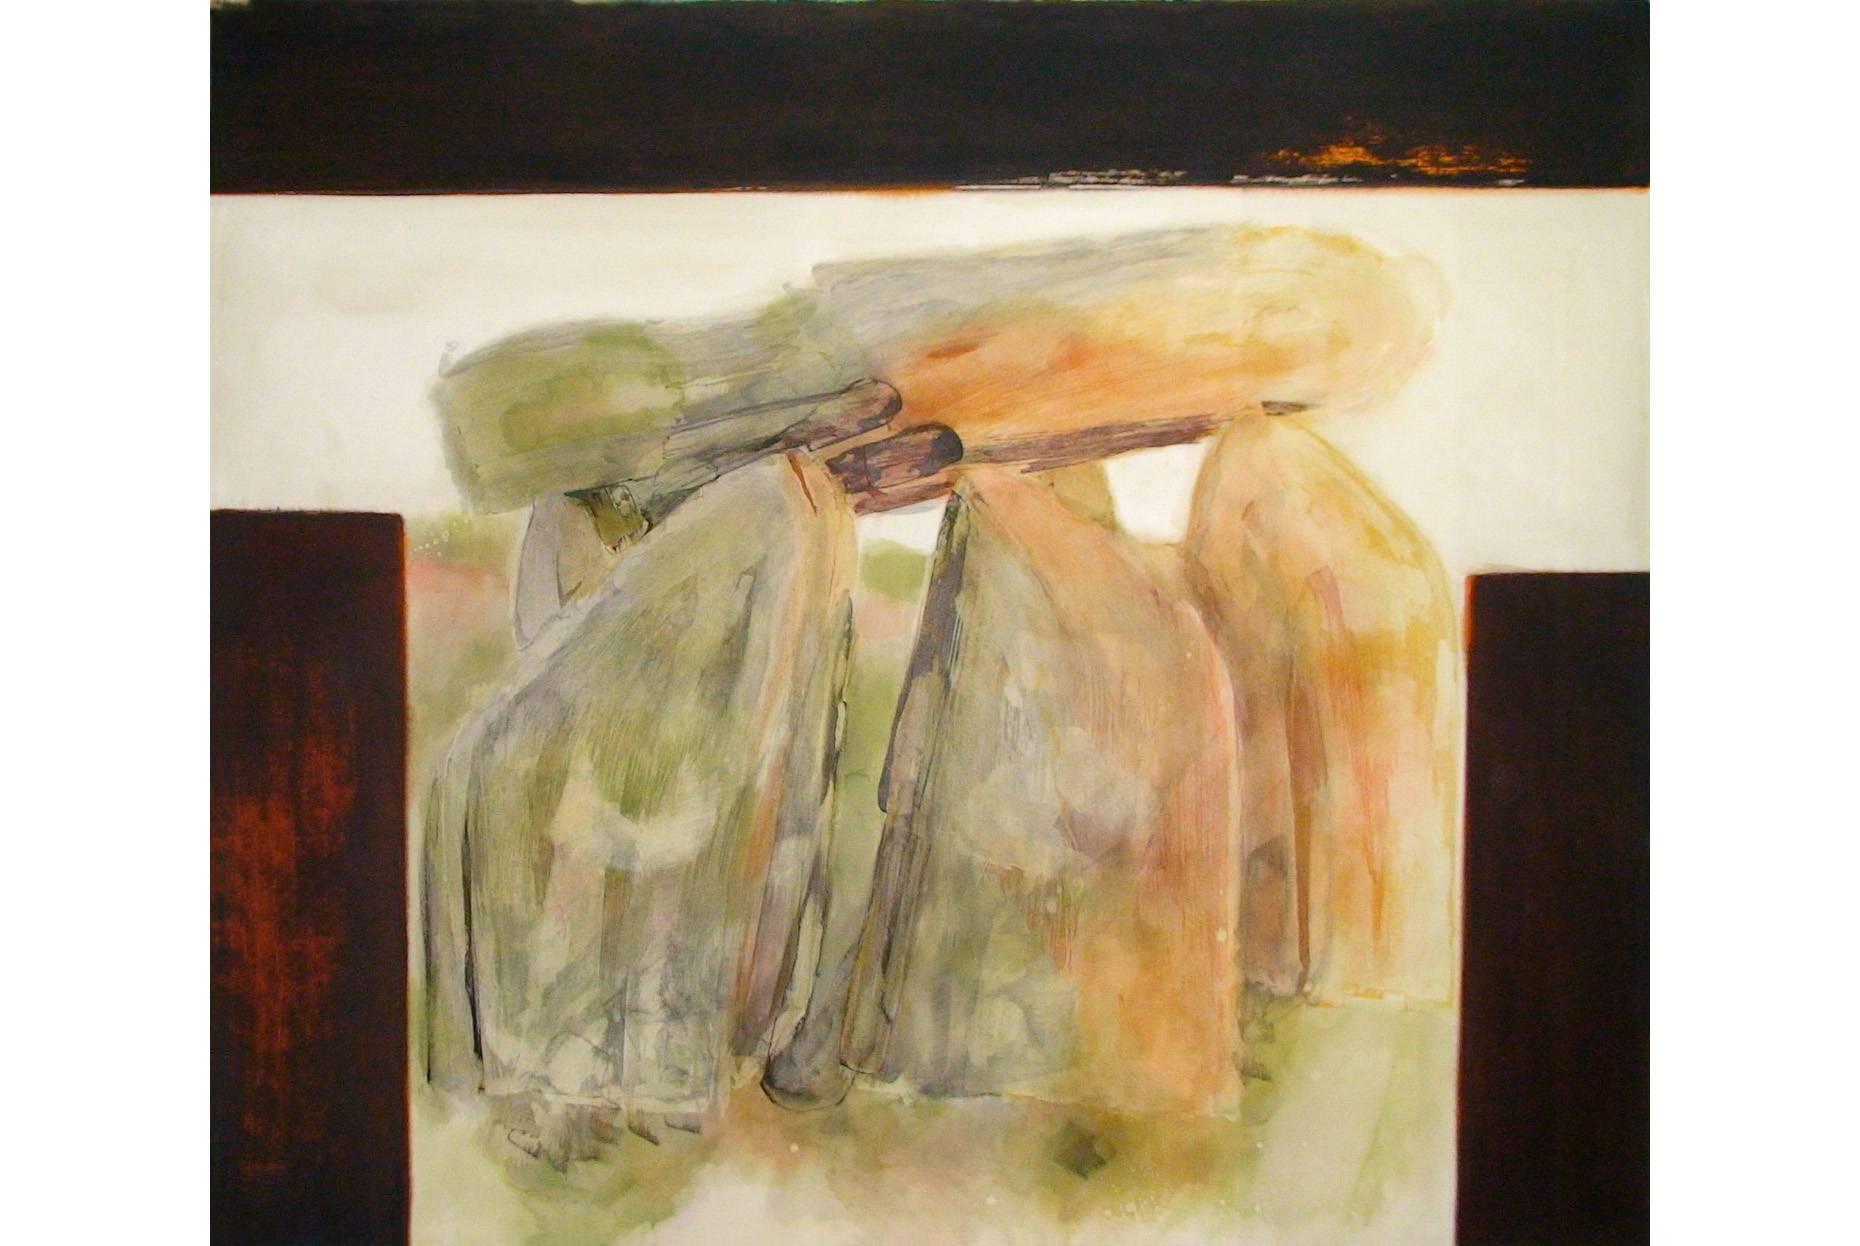 Fundus/Grundlage 1996 Acrylfarbe a/Nessel 190 x 220 cm